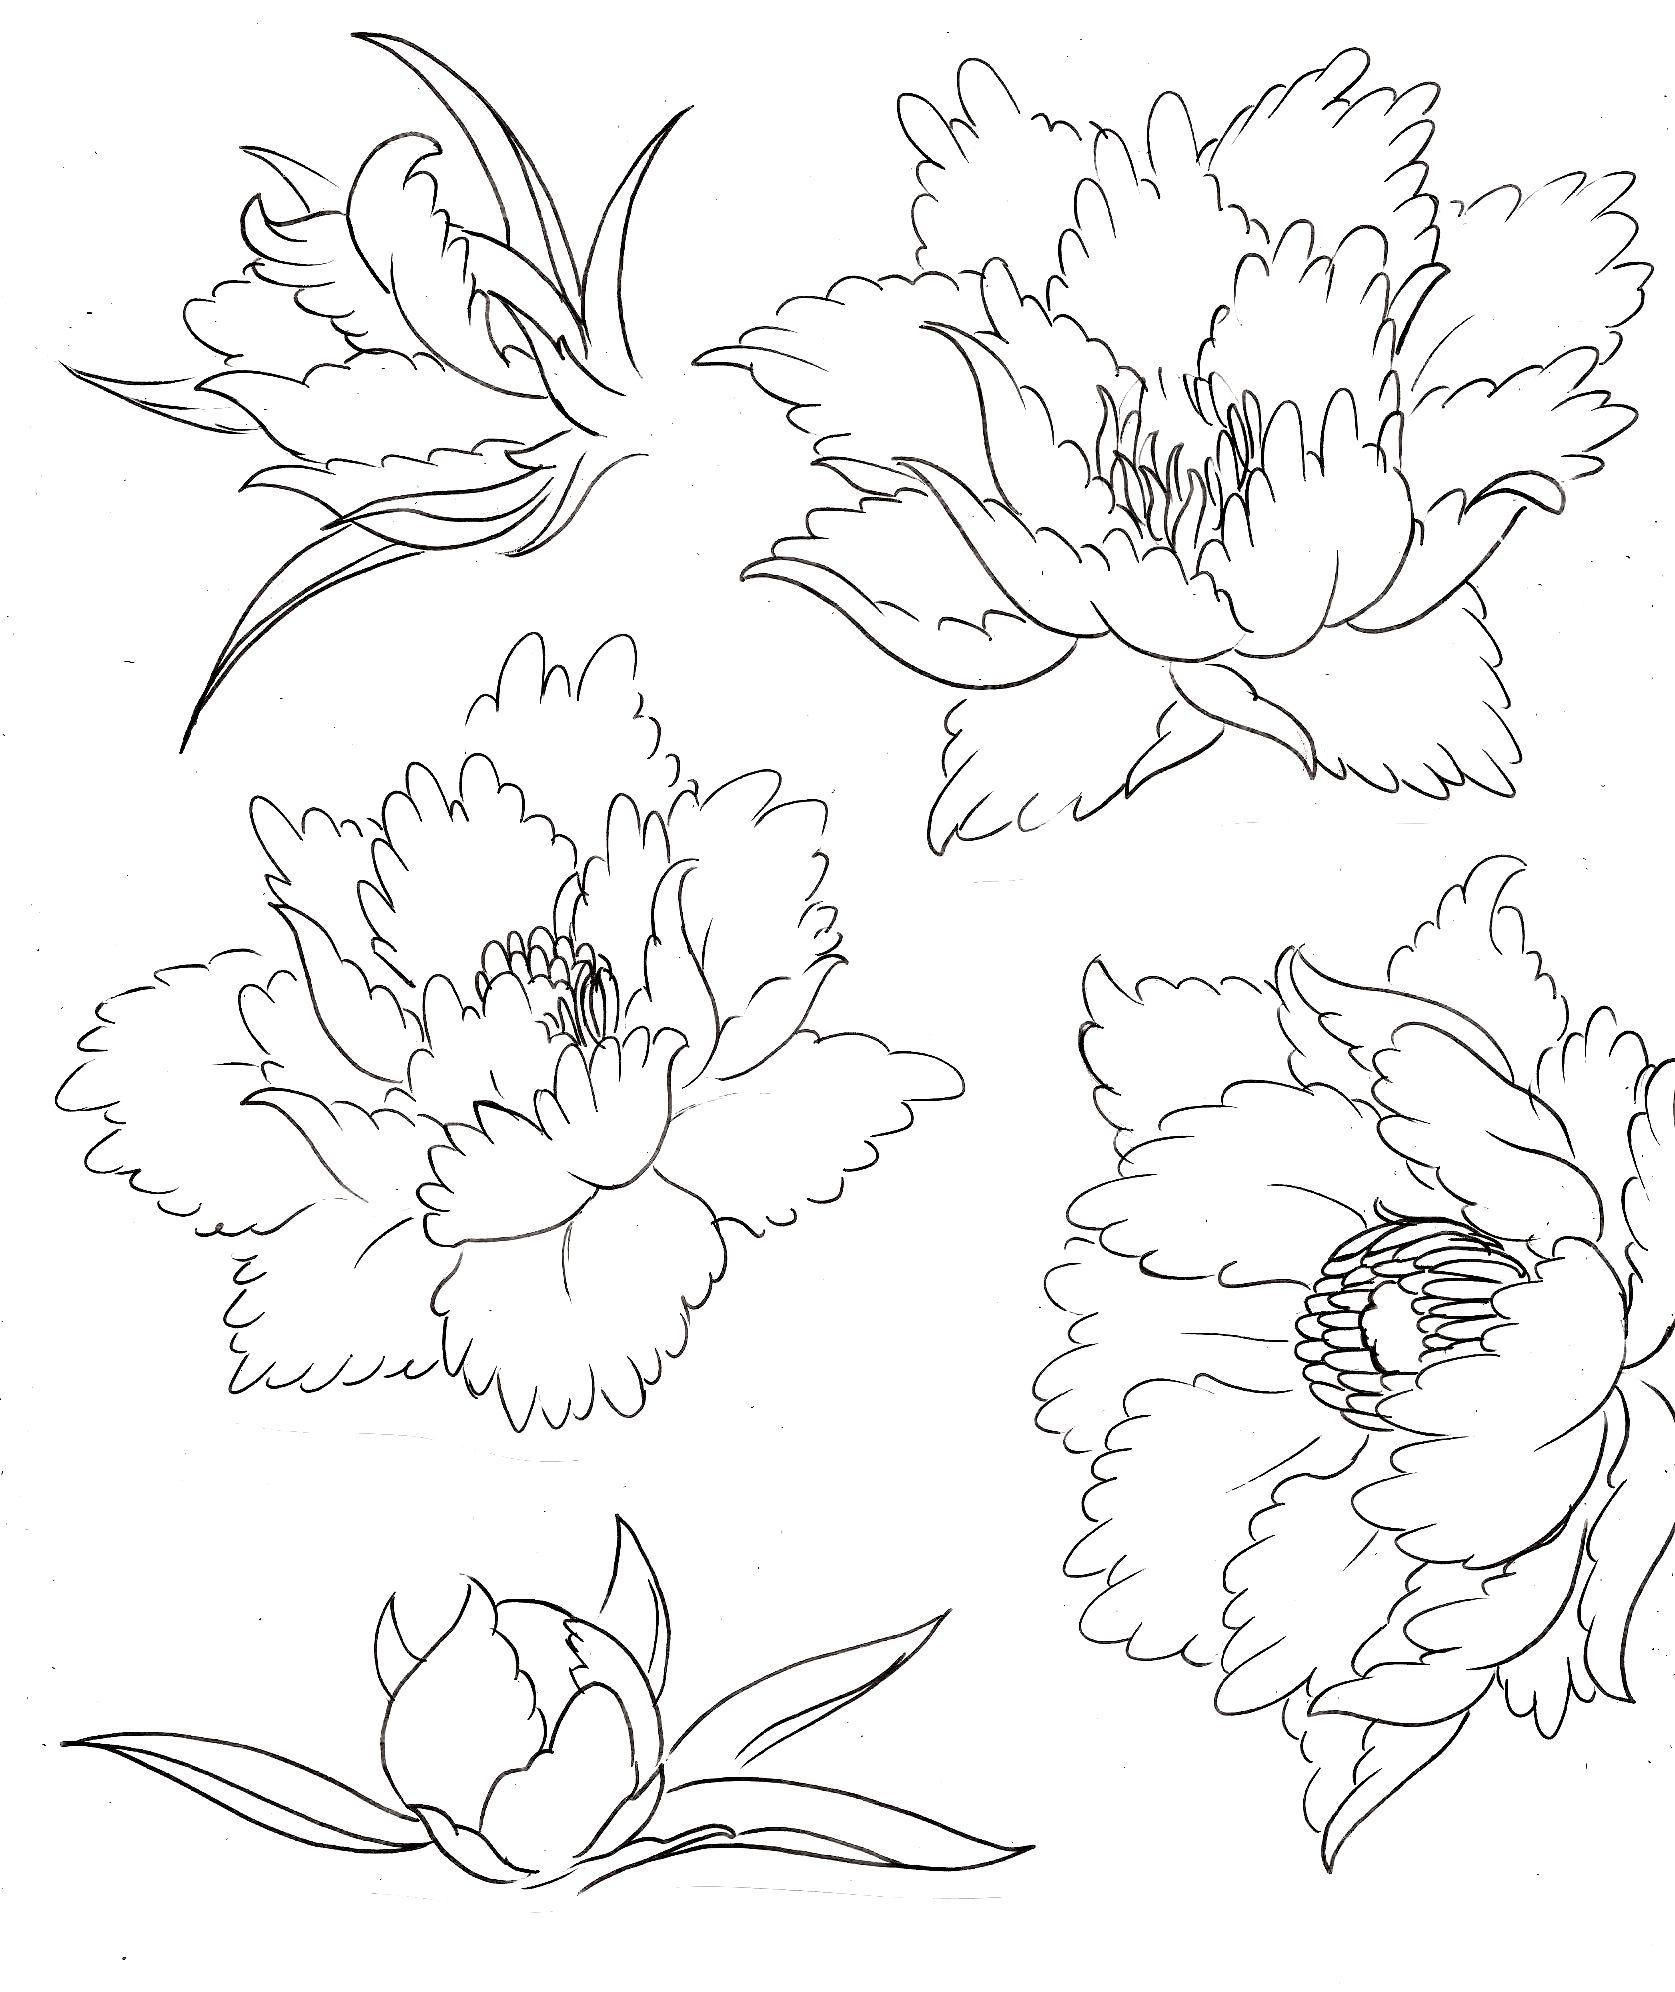 40 Id�es De Mod�le De Tatouage à Motifs Diff�rents €� Gratuit Peony Flower  Tattoospeonies Tattoojapanese